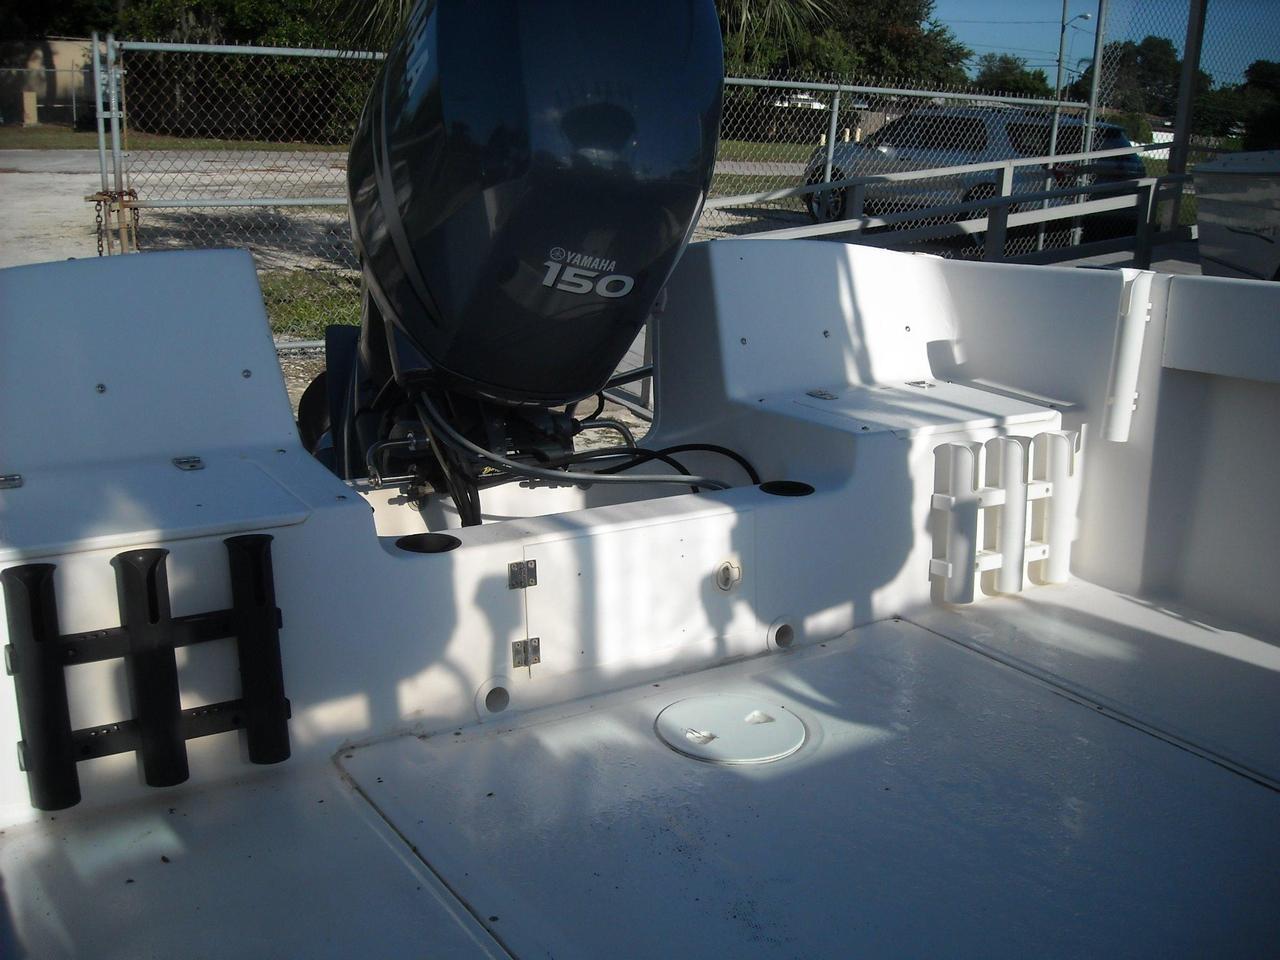 2004 used angler 204wa walkaround fishing boat for sale for Angler fish for sale